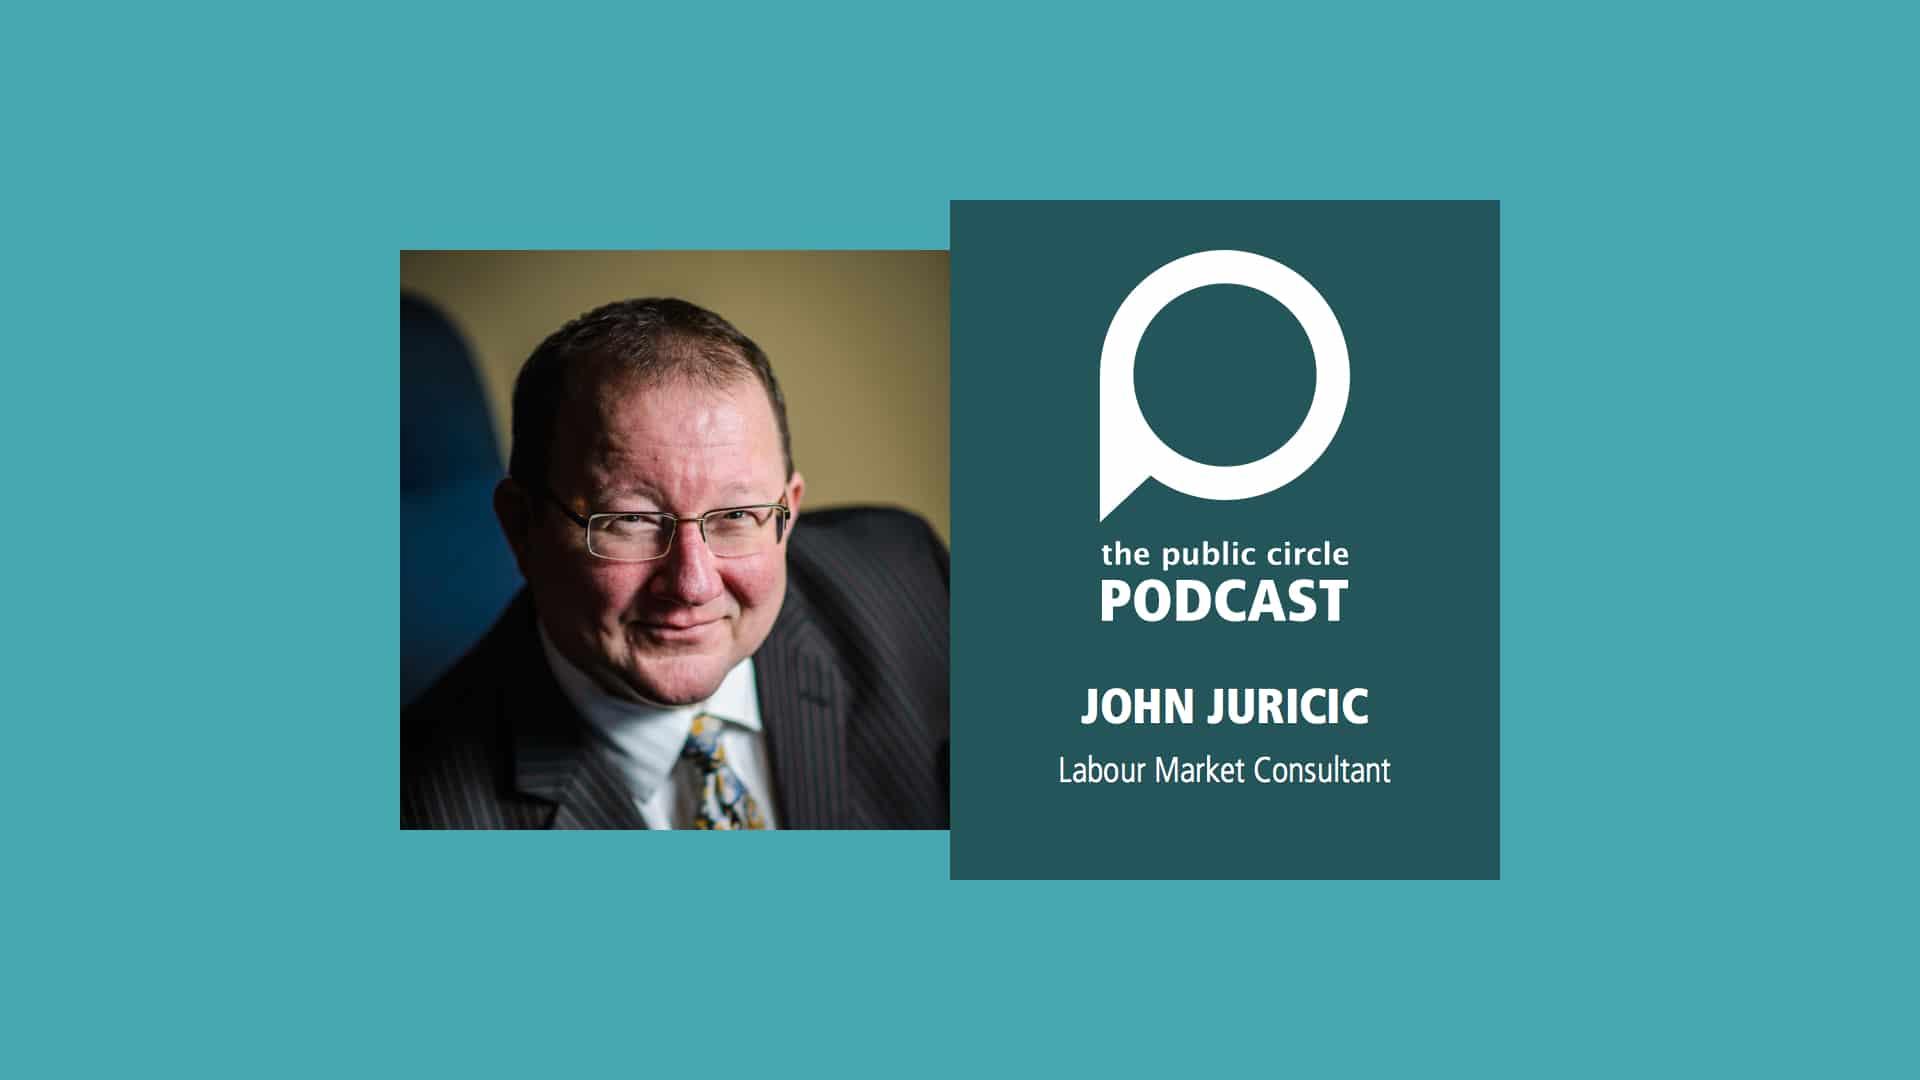 PODCAST: John Juricic, Labour Market Consultant